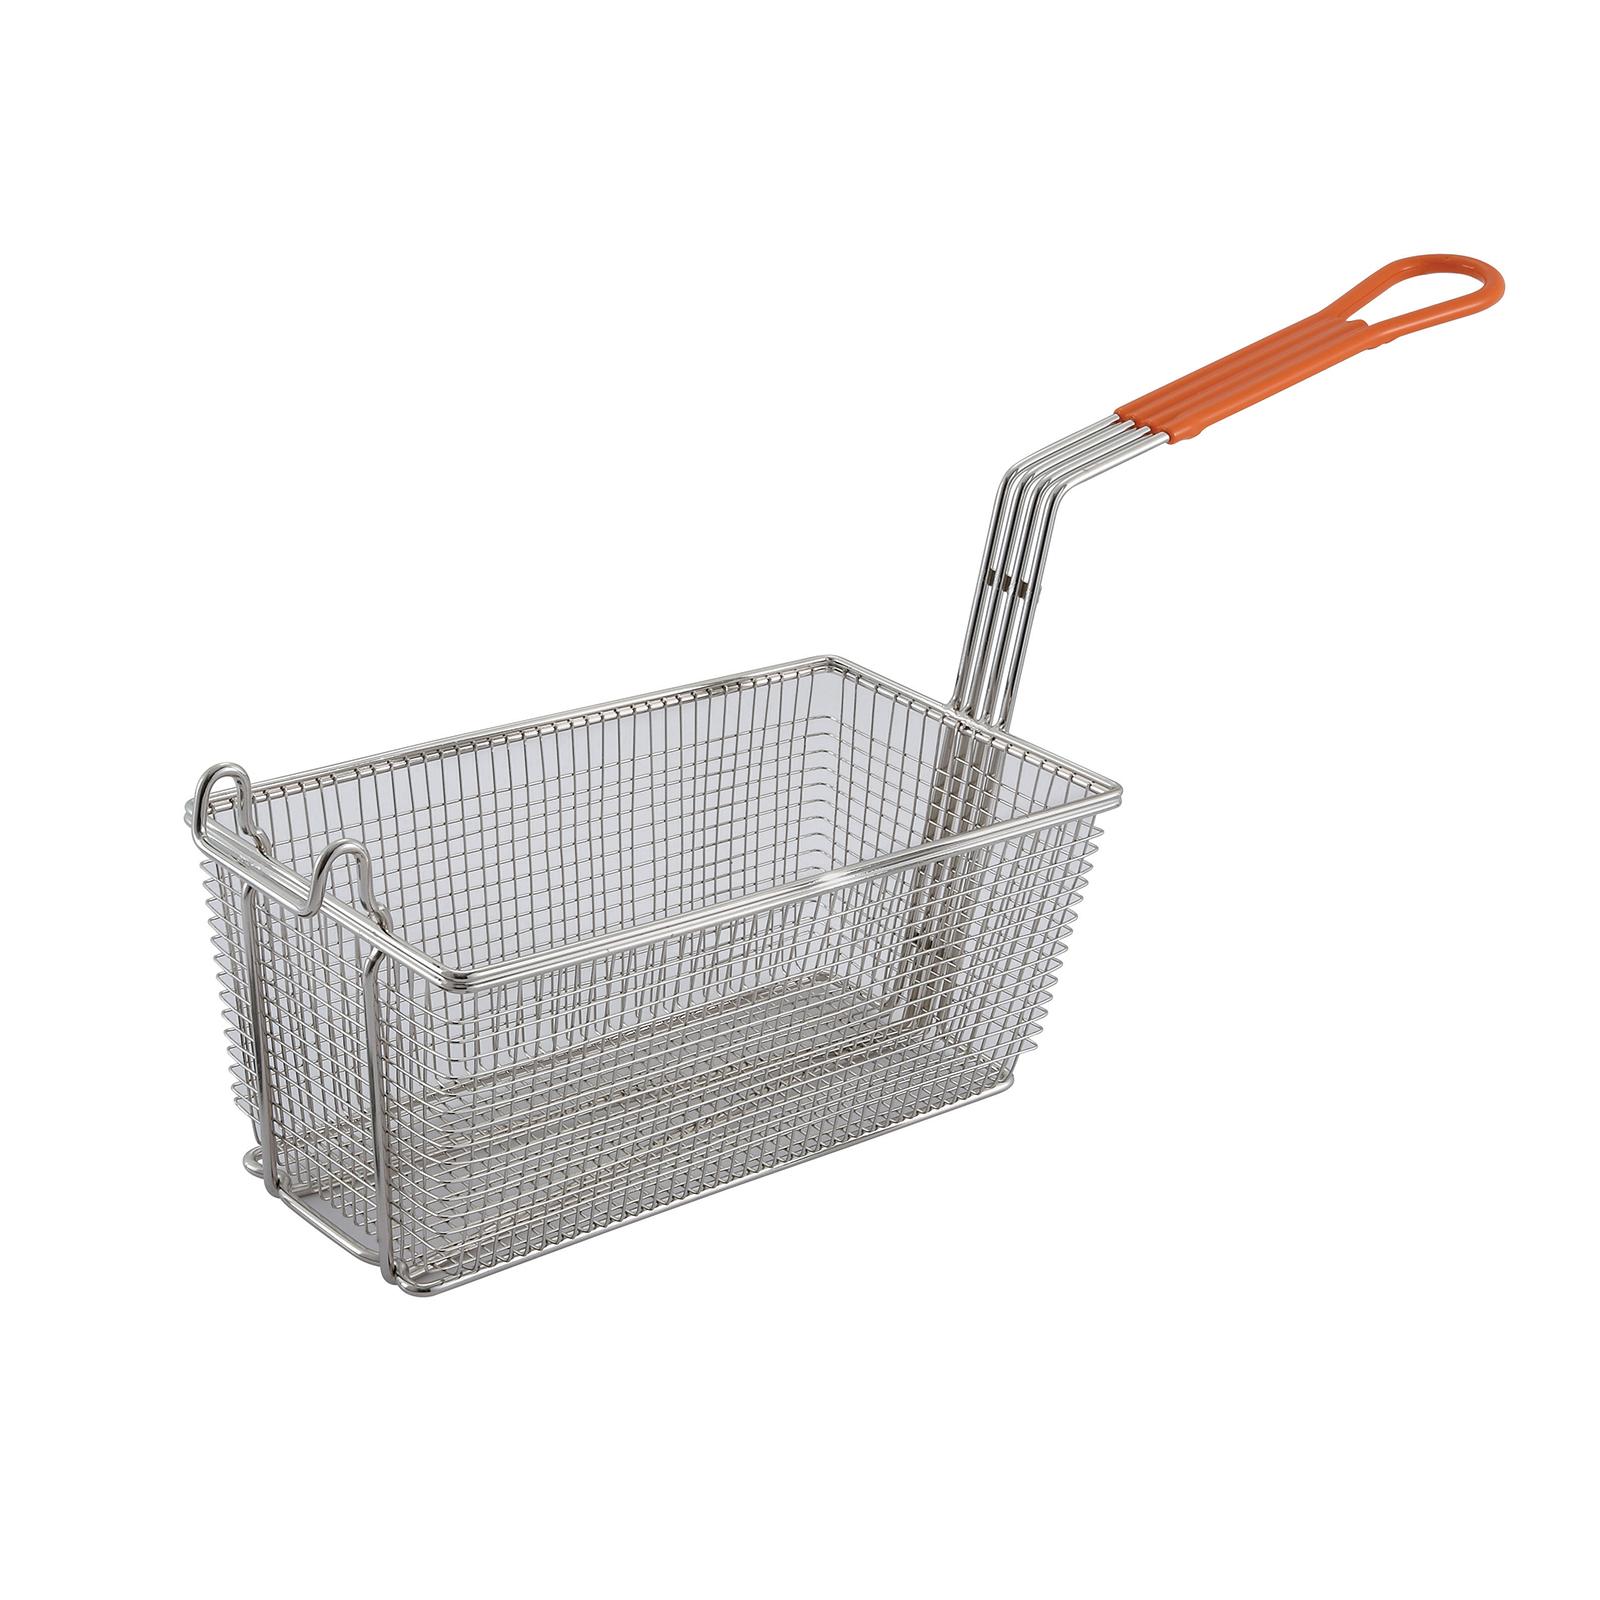 1600-19 Winco FB-10 fryer basket